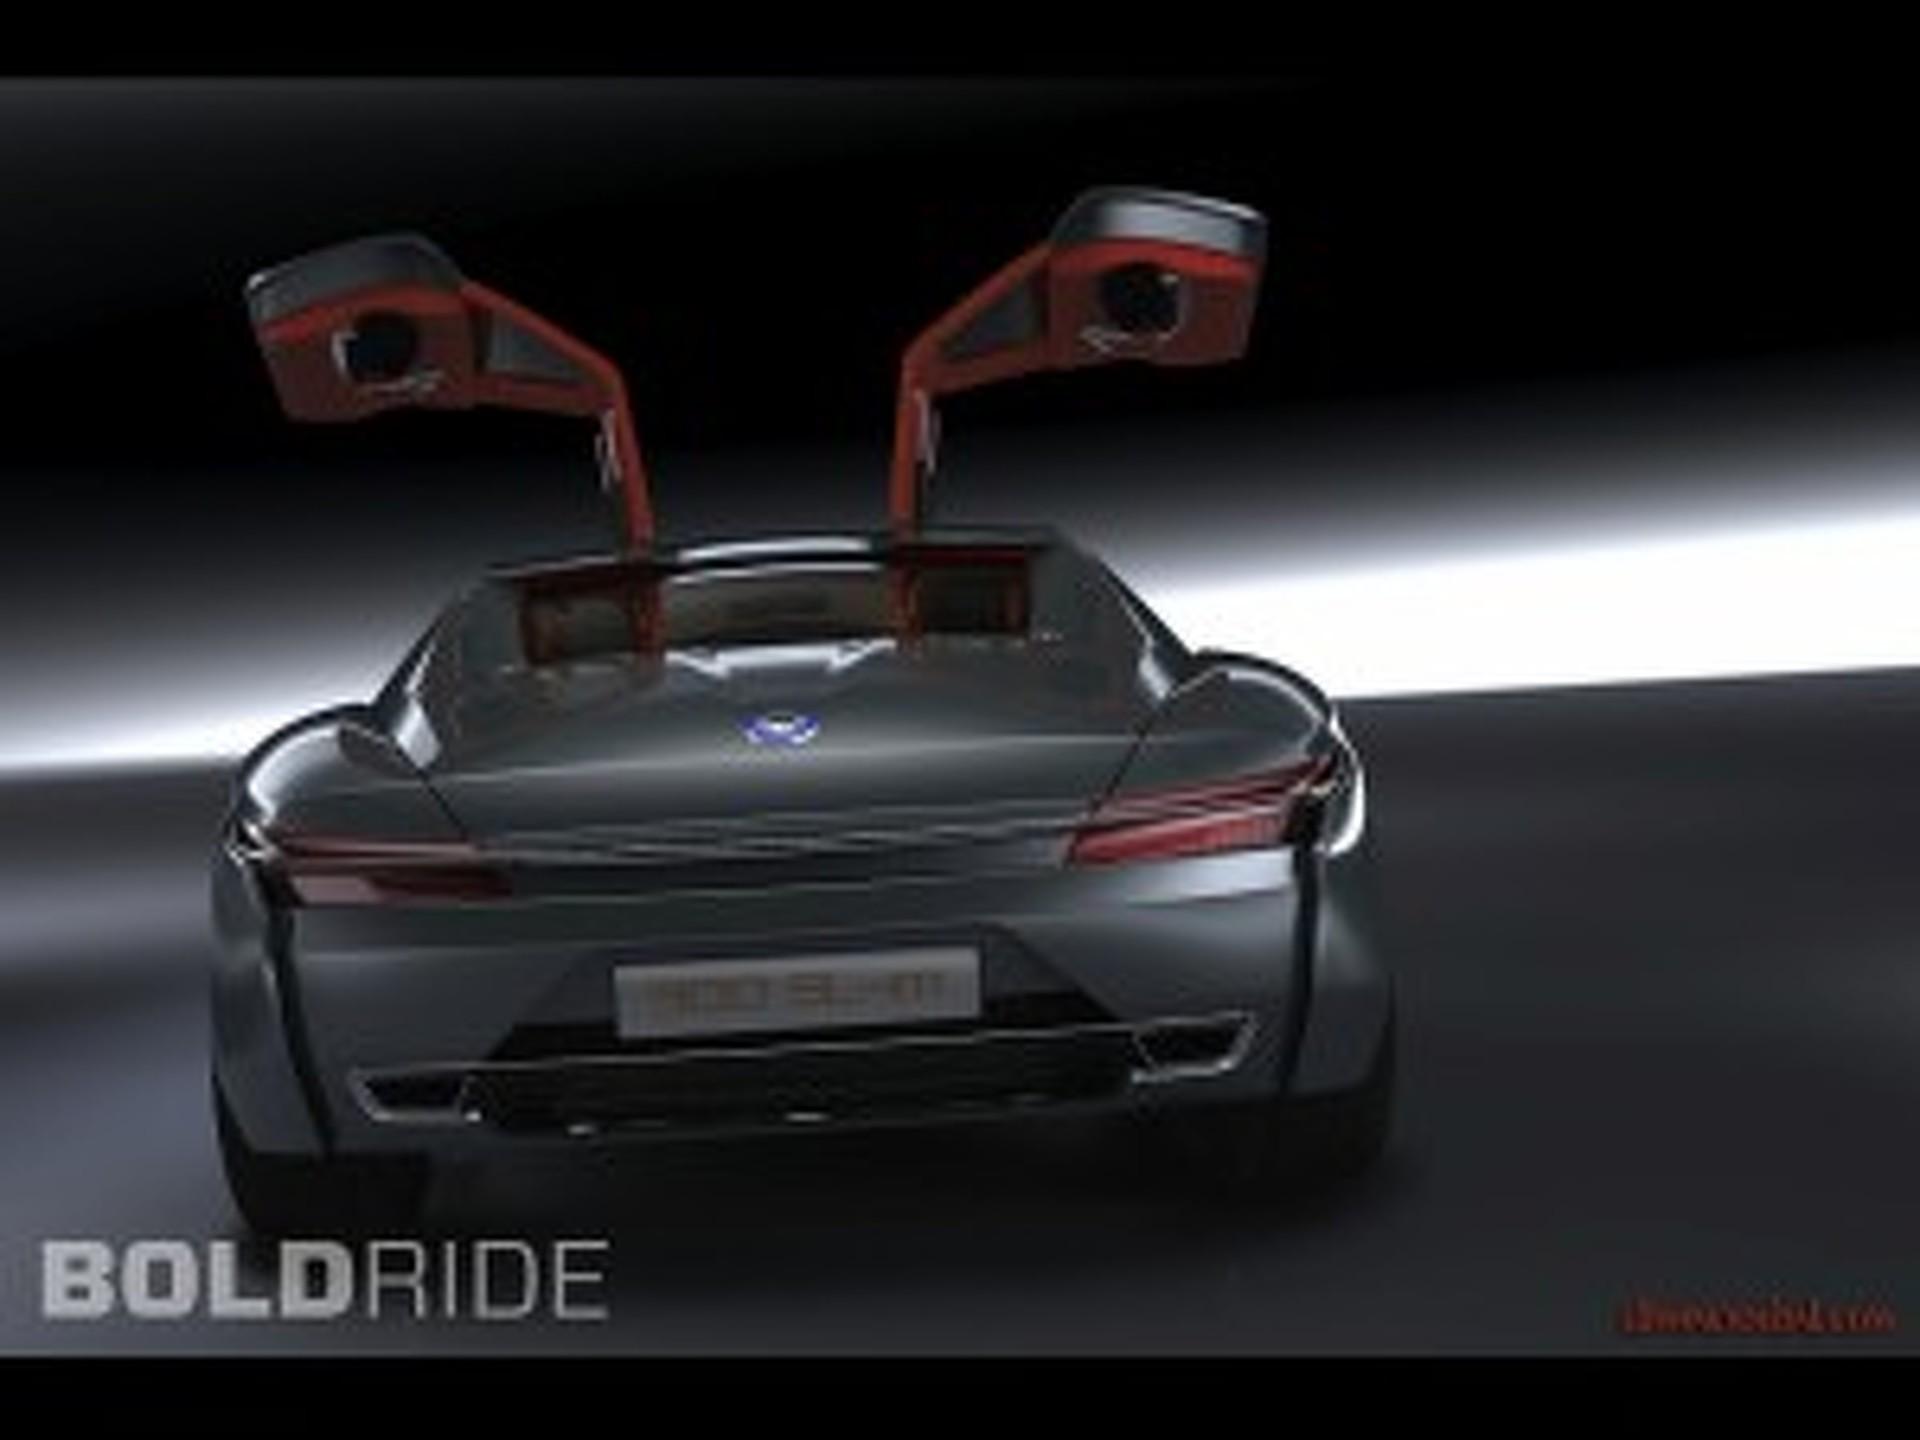 Unveiled: French Designer Creates the Retro-Inspired 2015 300 SL